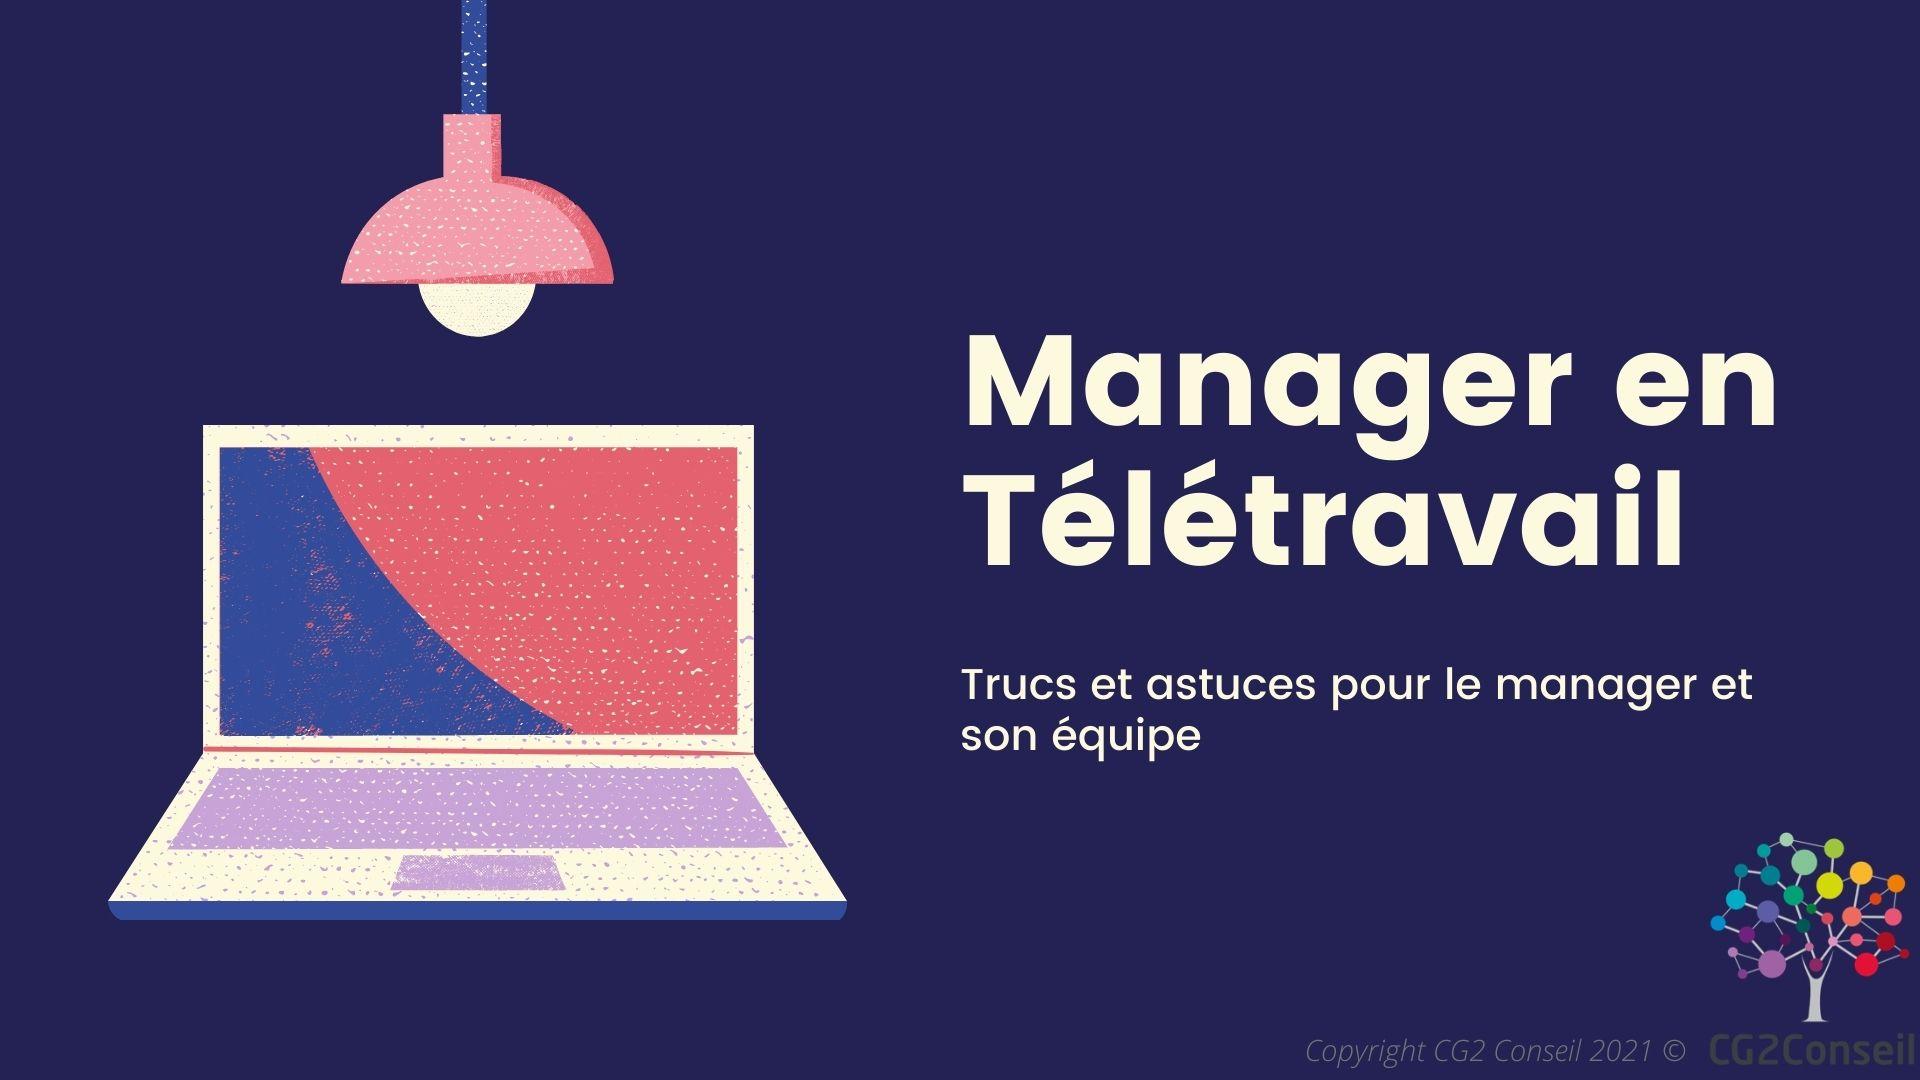 Teletravail-Slide (1)